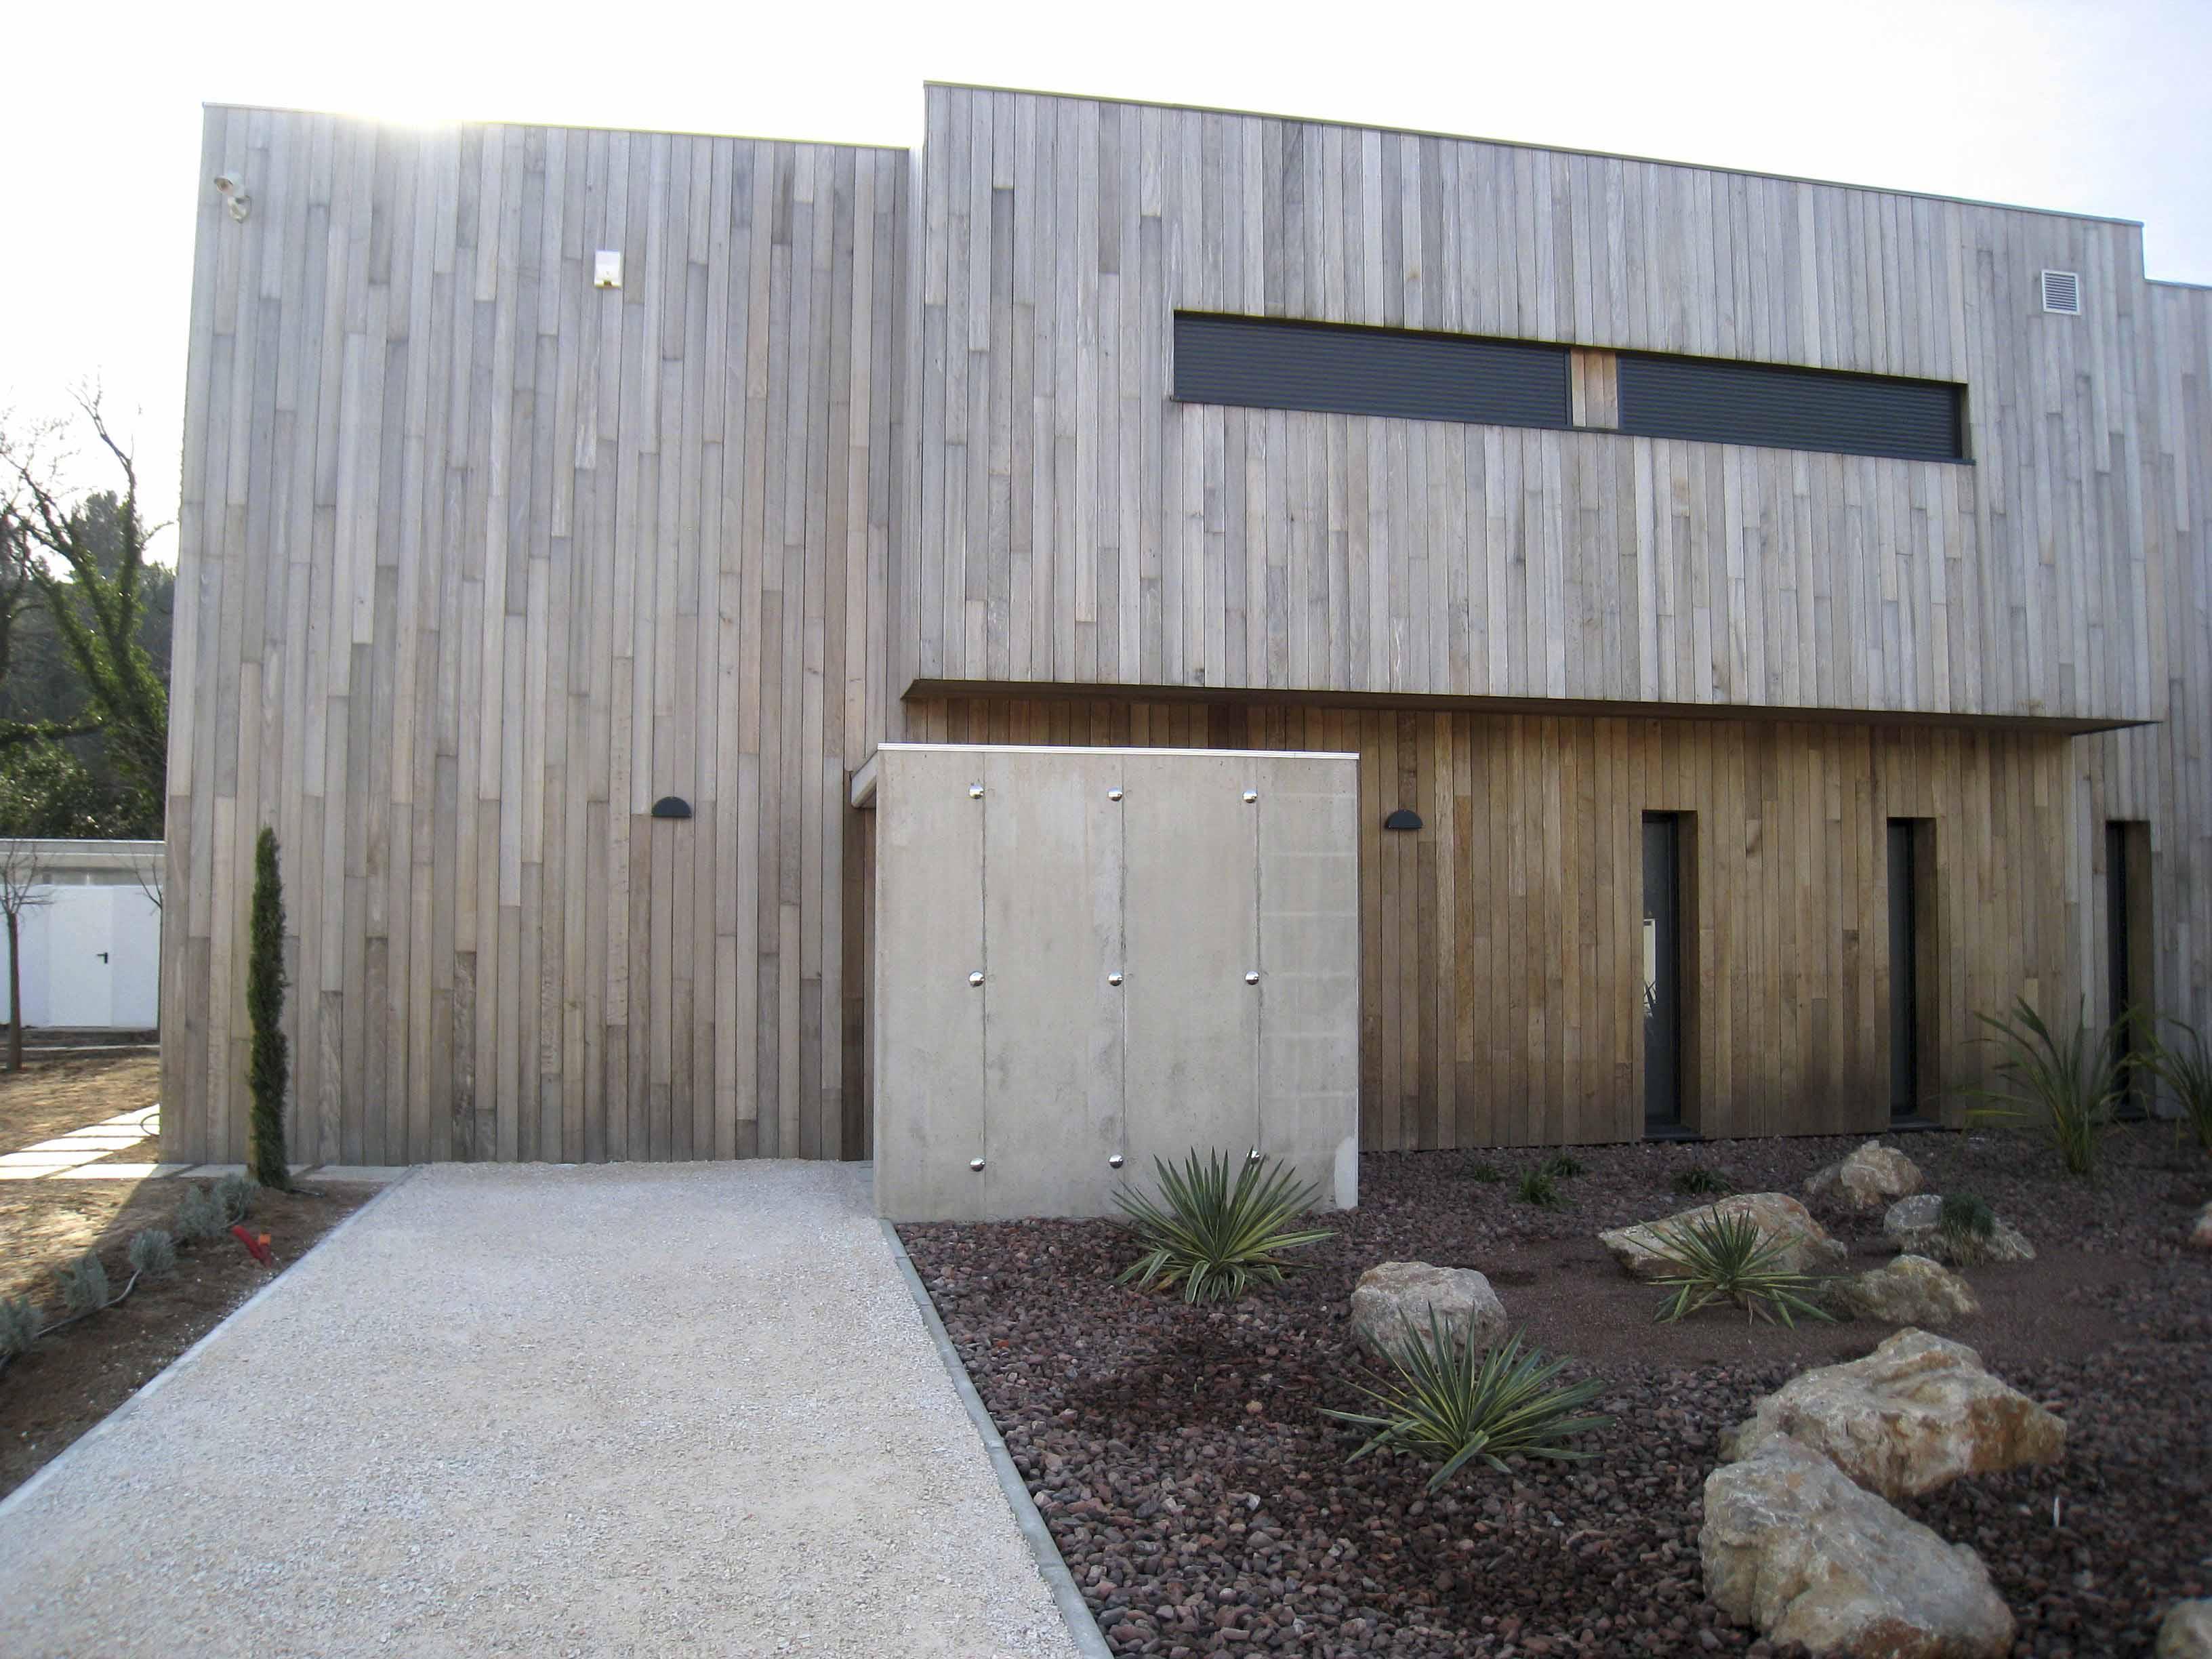 Maison individuelle Clermont Hérault BF Architecture 6